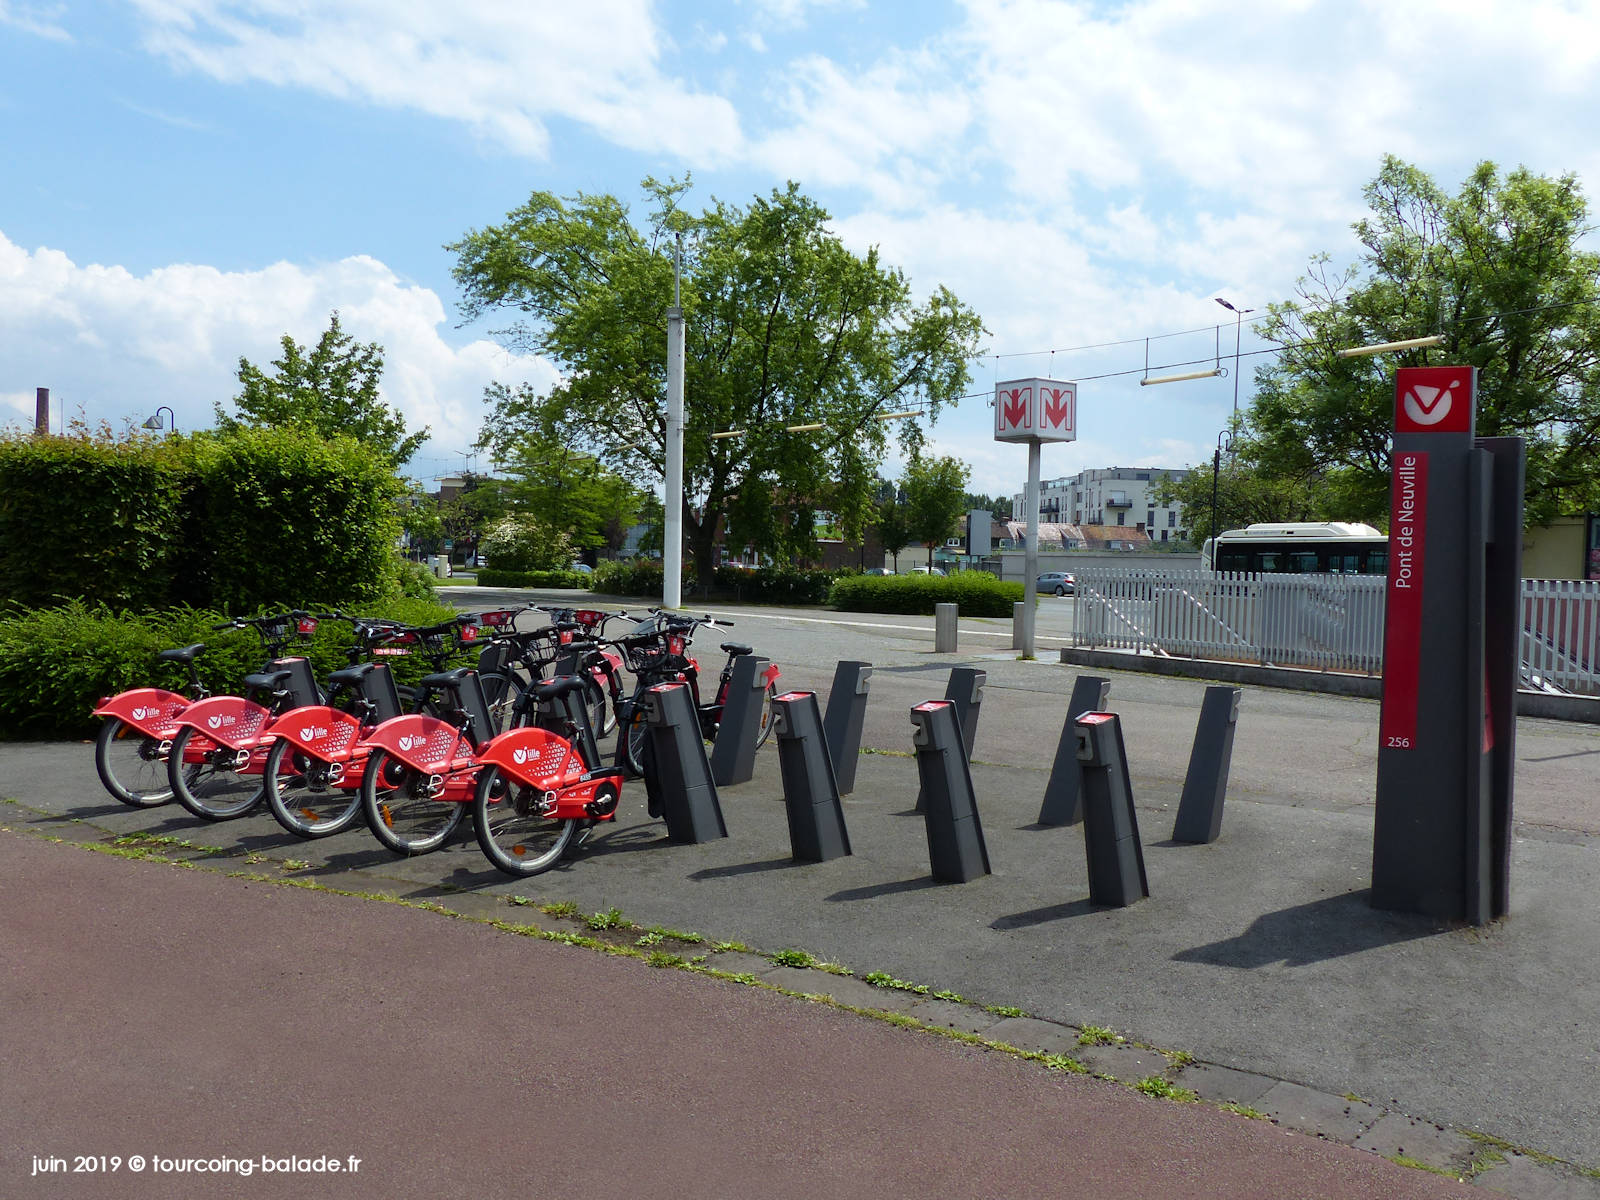 Station Vélos V'Lille Pont de Neuville, Tourcoing, 2019